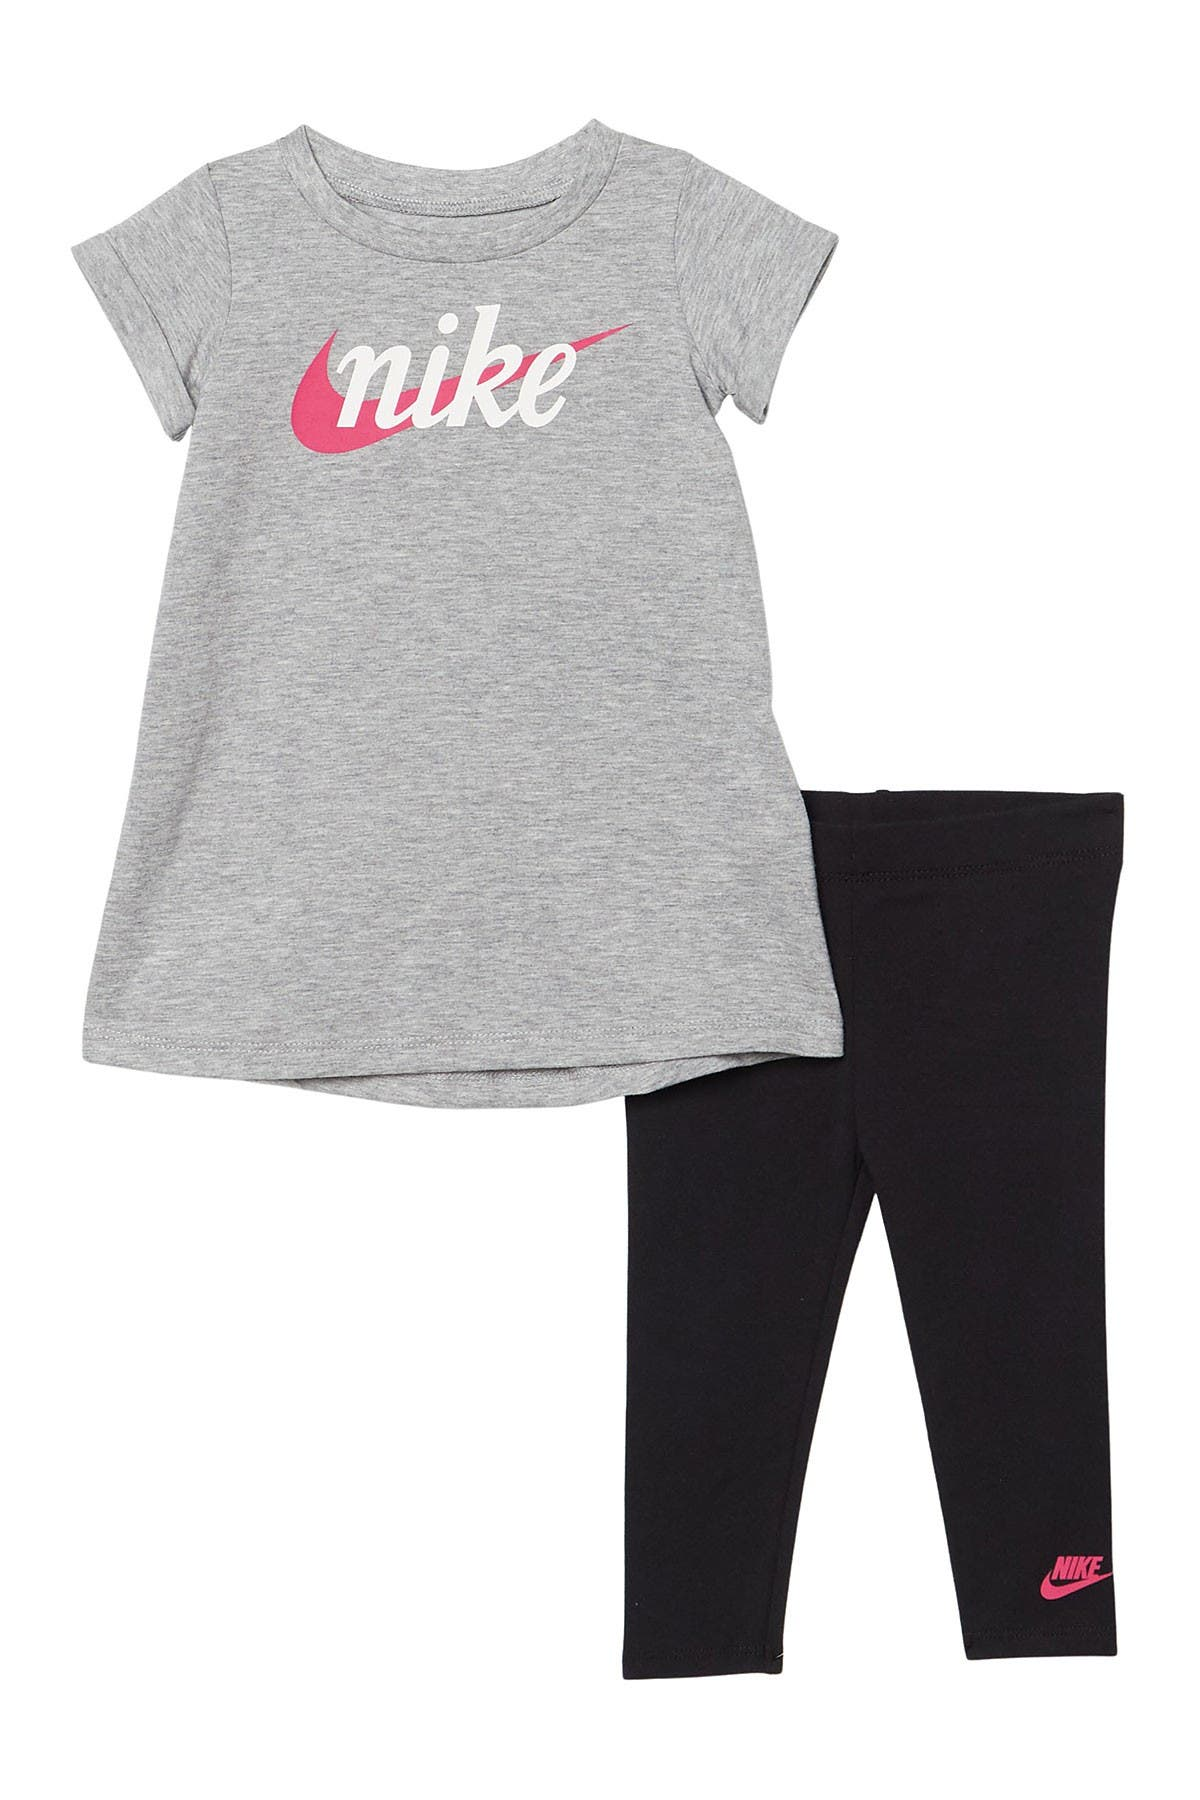 Image of Nike Short Sleeve Dress & Leggings Set